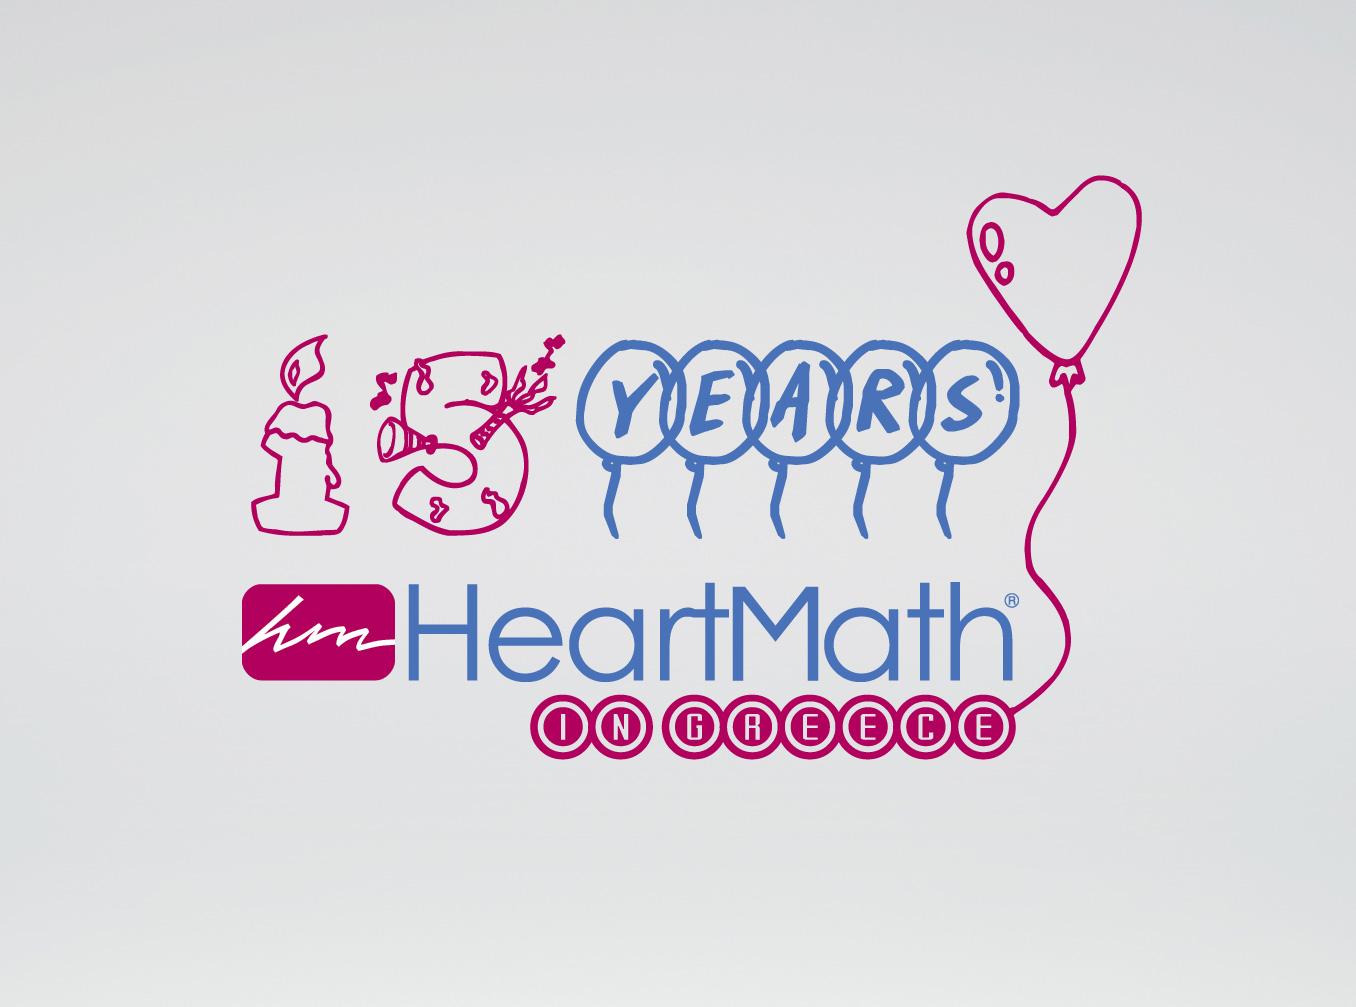 15-Years-Heartmath-Greece.jpg